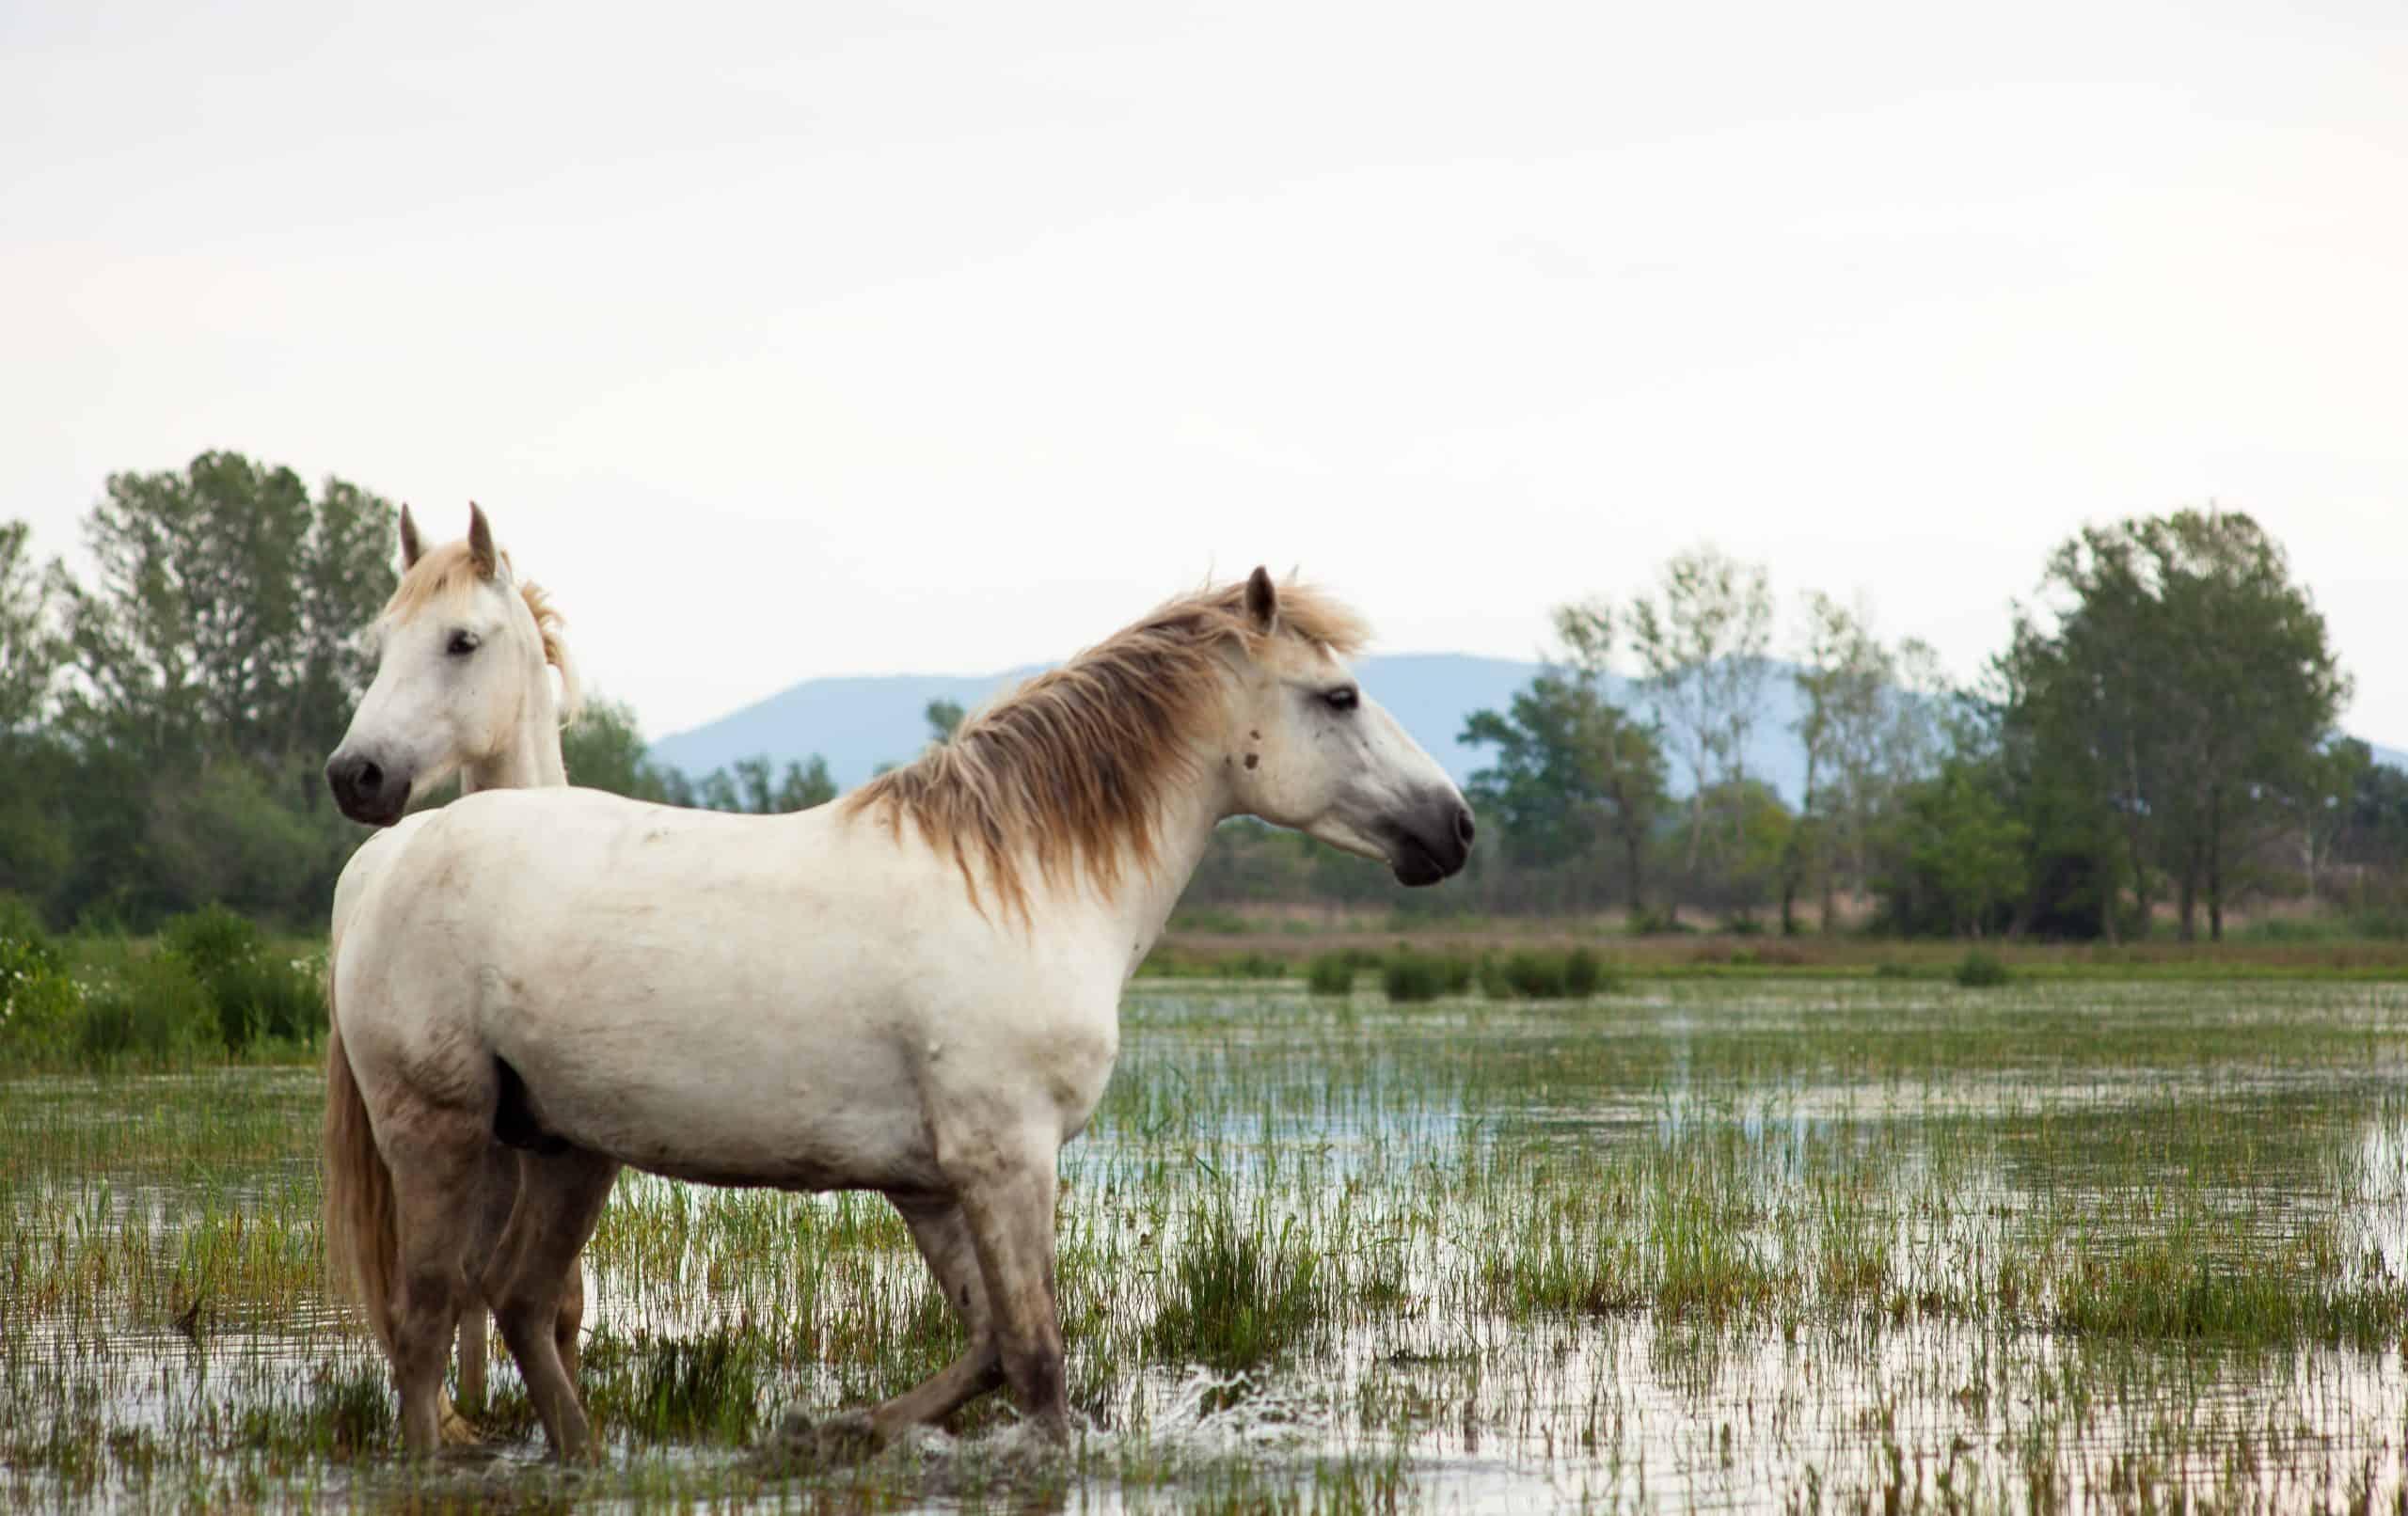 Camargue horses in a swamp - Isola della cona